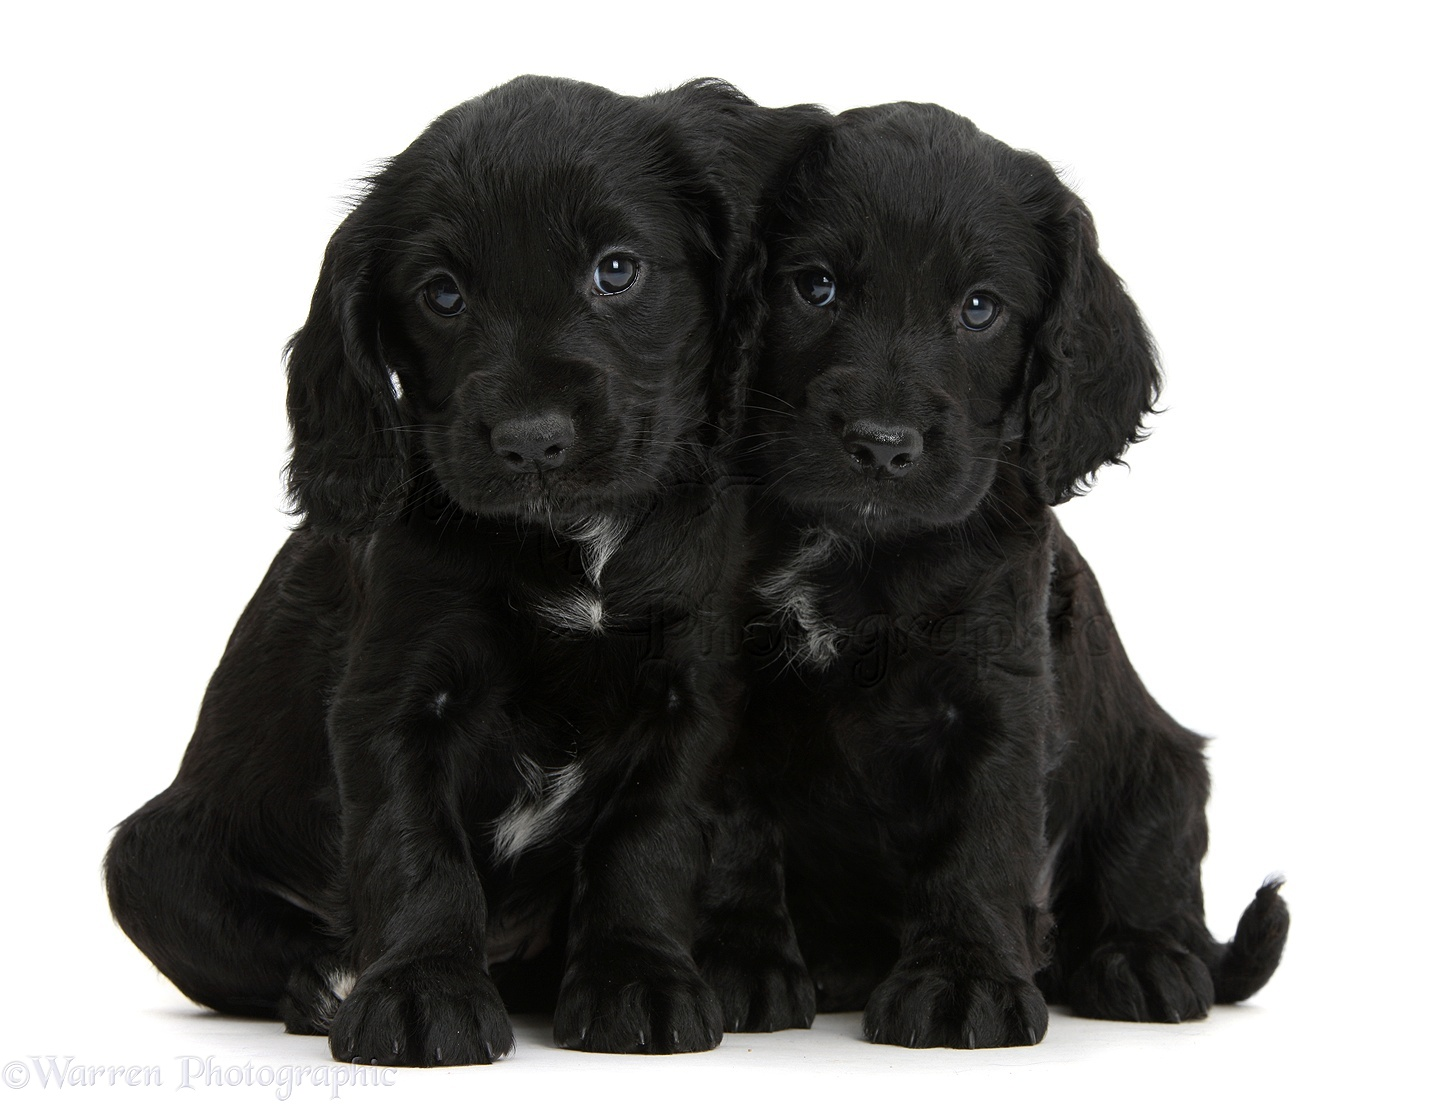 Dogs Black Cocker Spaniel Puppies Photo Wp39375